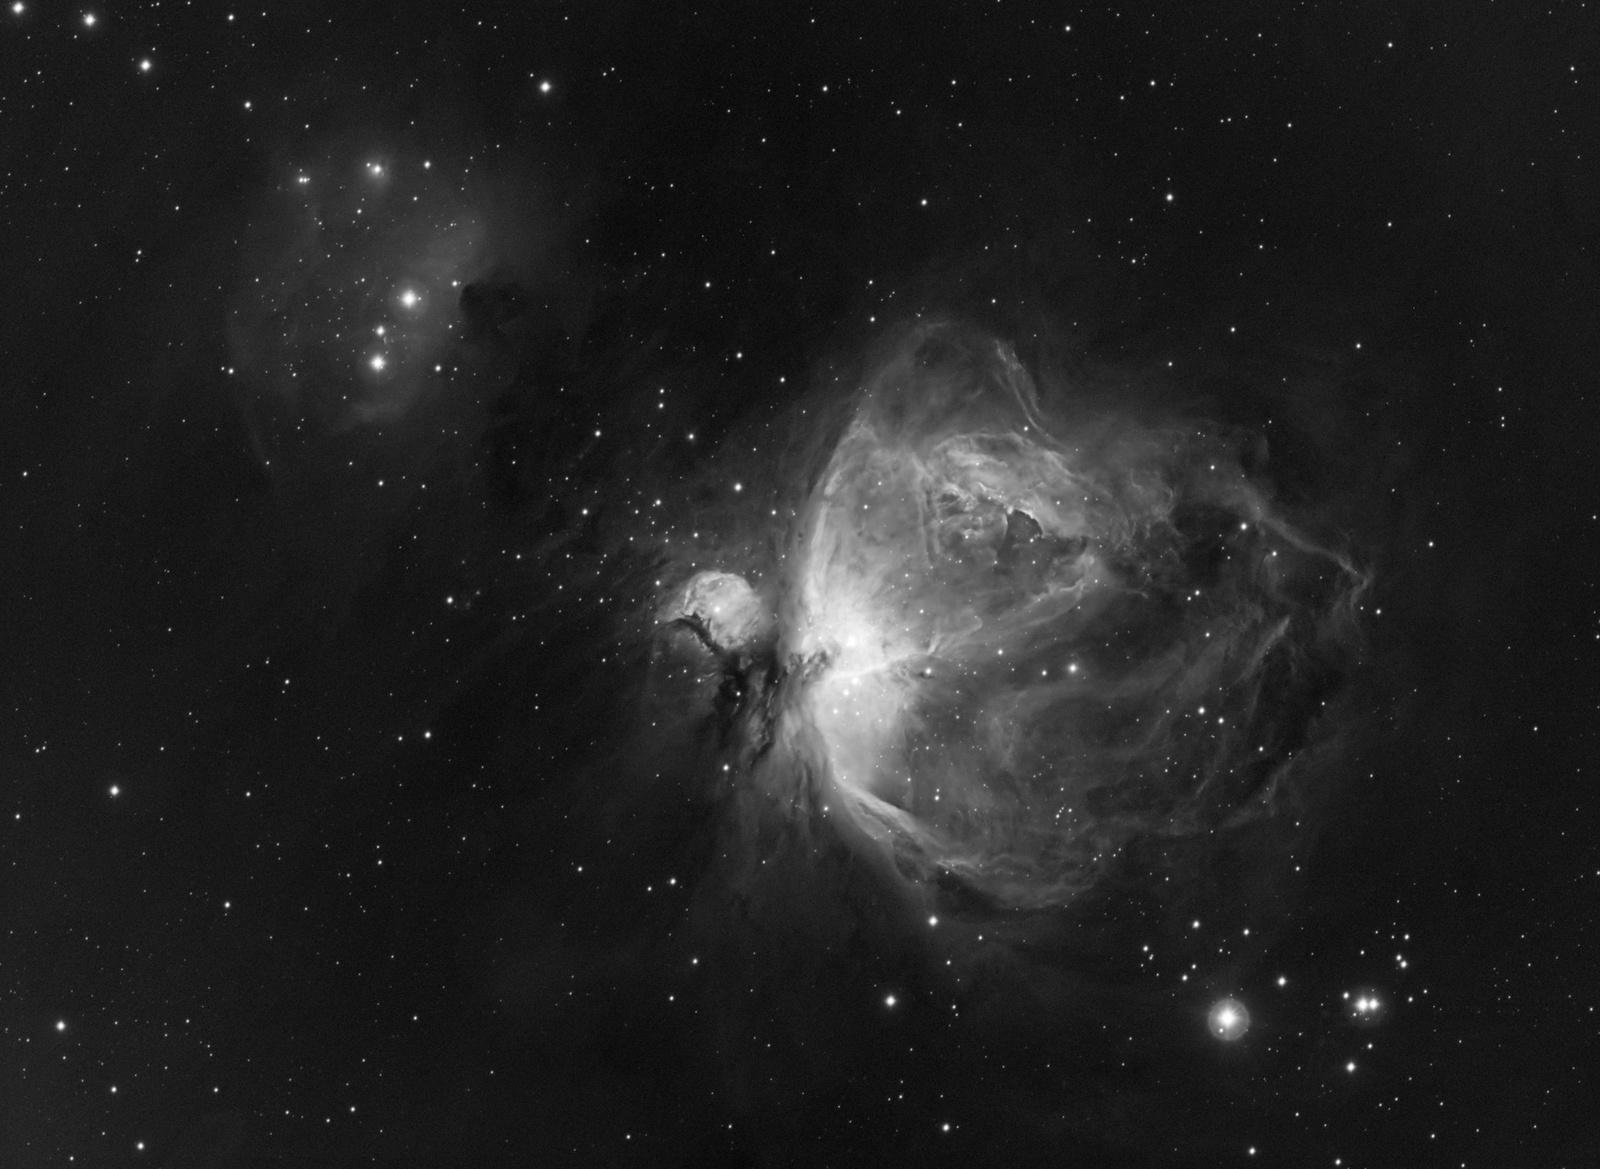 SII_SC_noB_cr_HT_ARGDRK_stars_bckgr_OK_FLAT_1920px.jpg